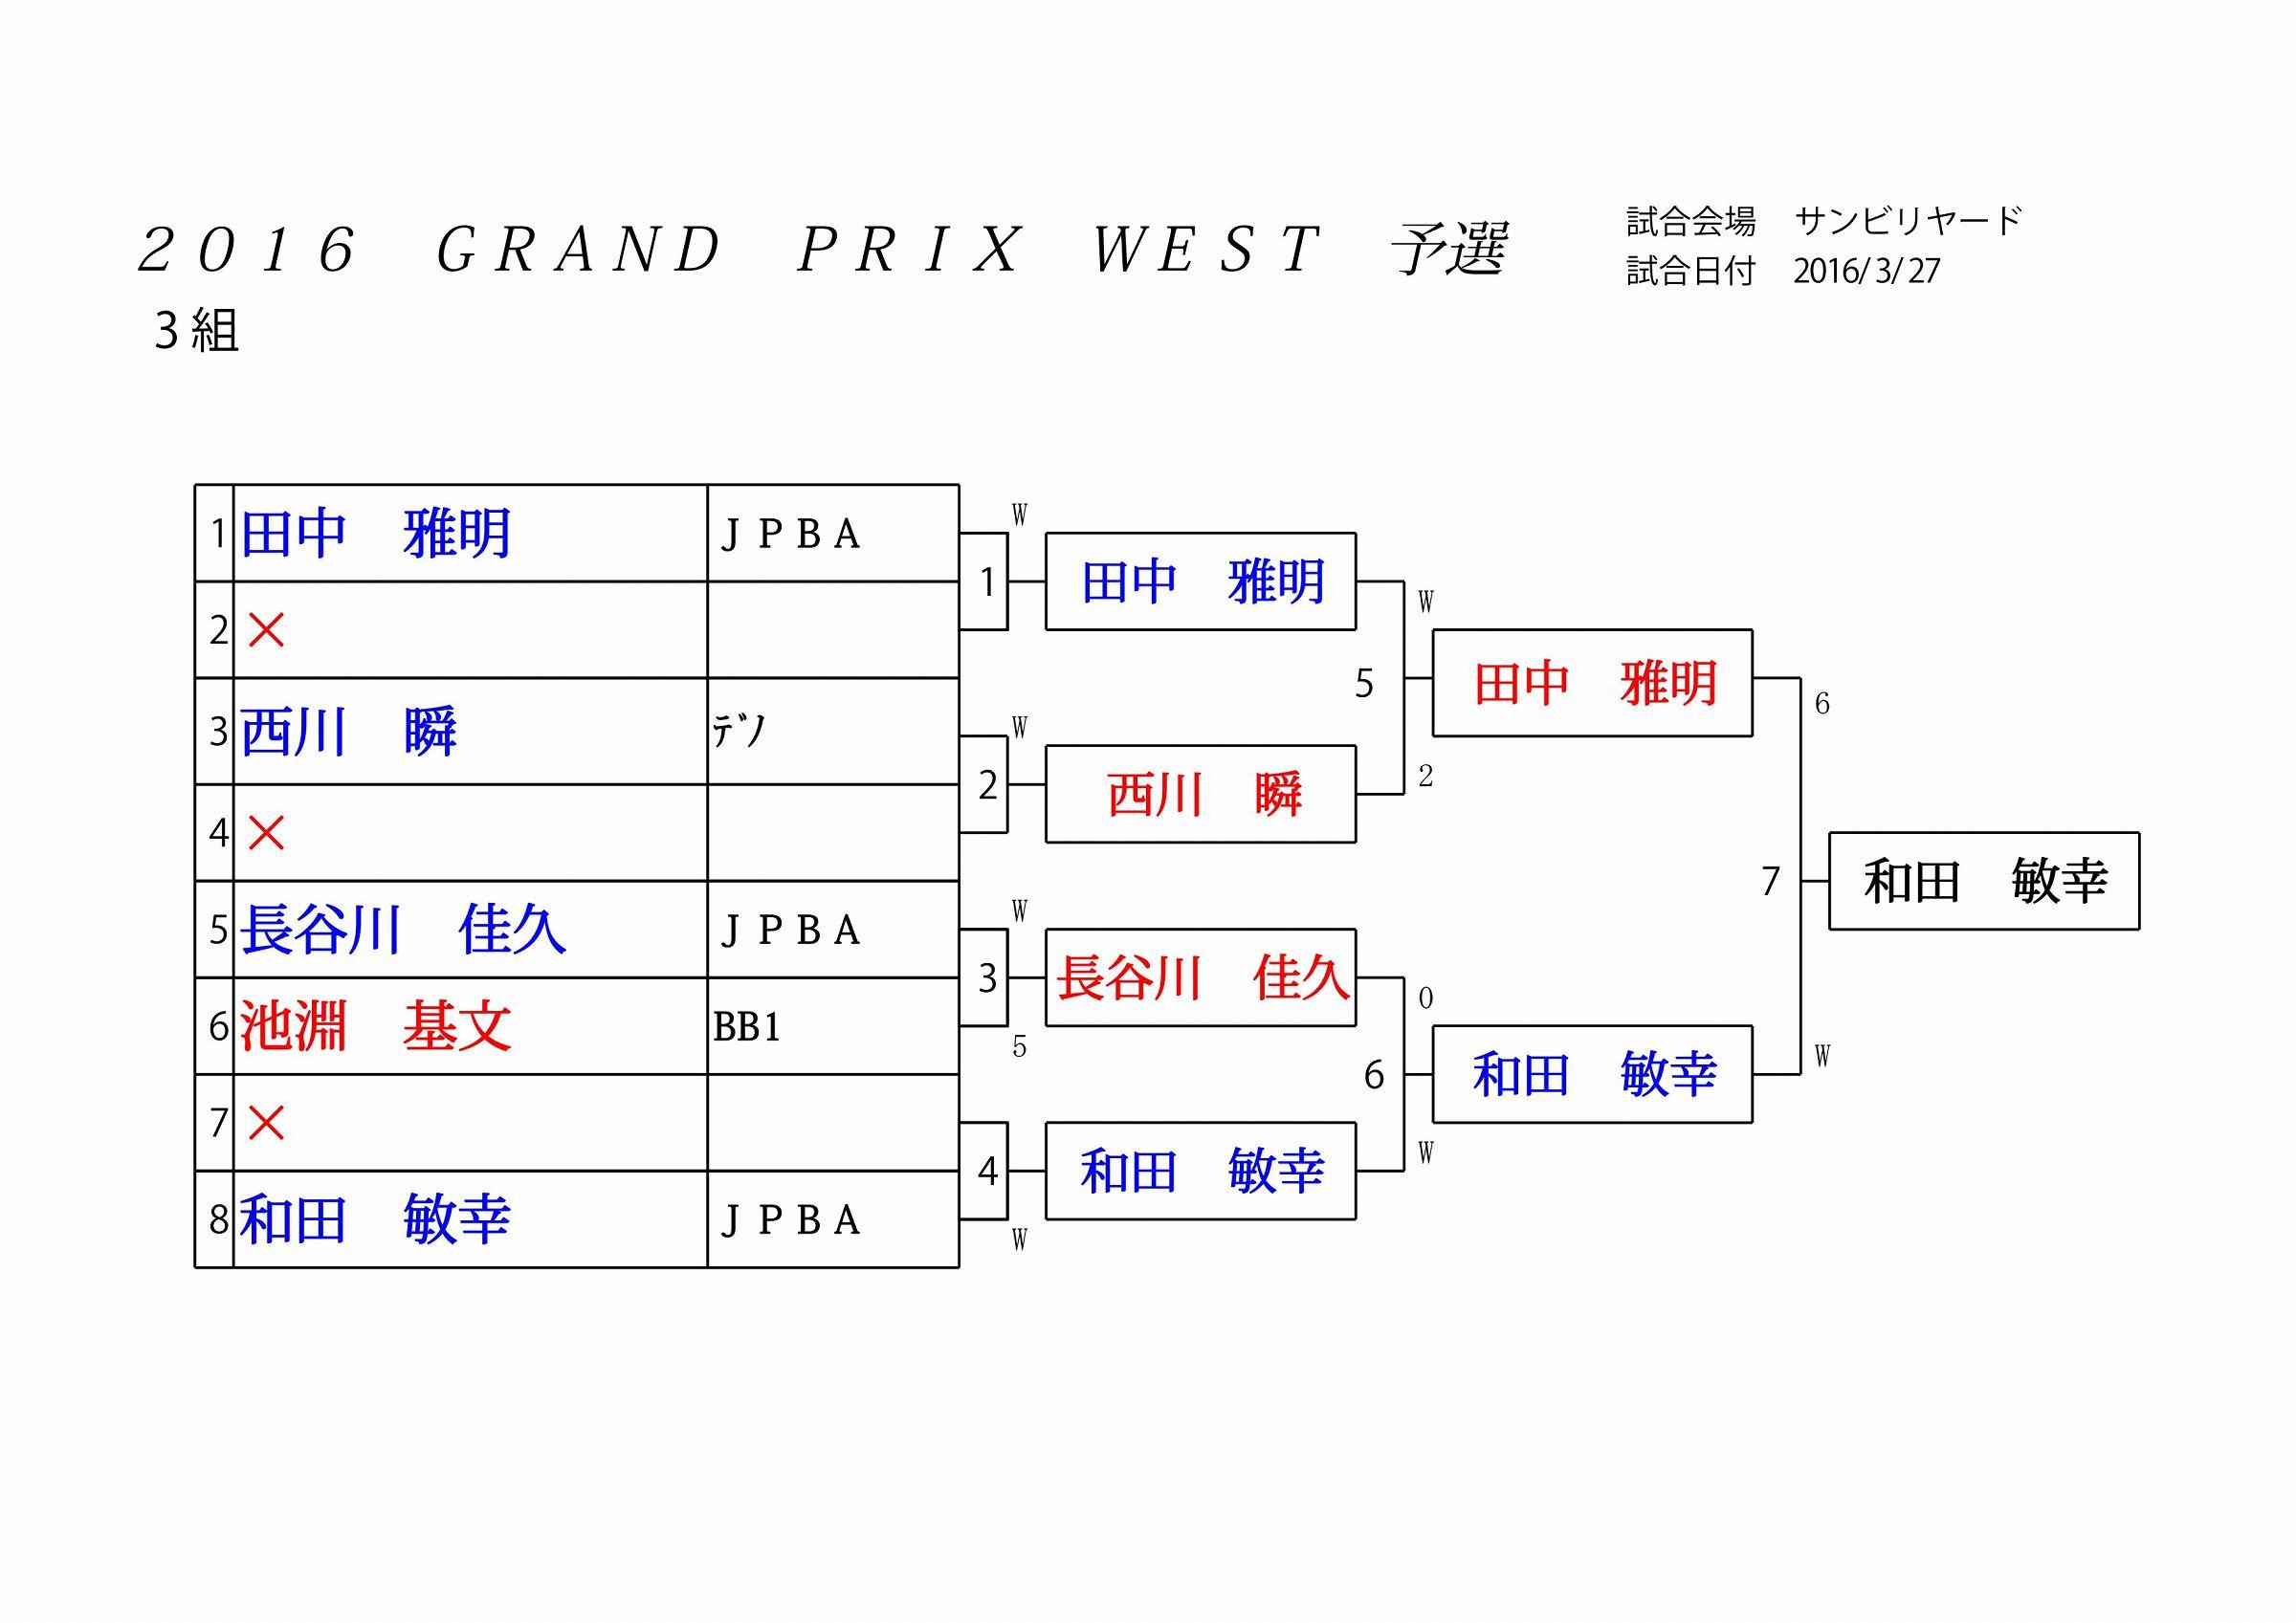 2016 GRAND PRIX WEST 予選_03